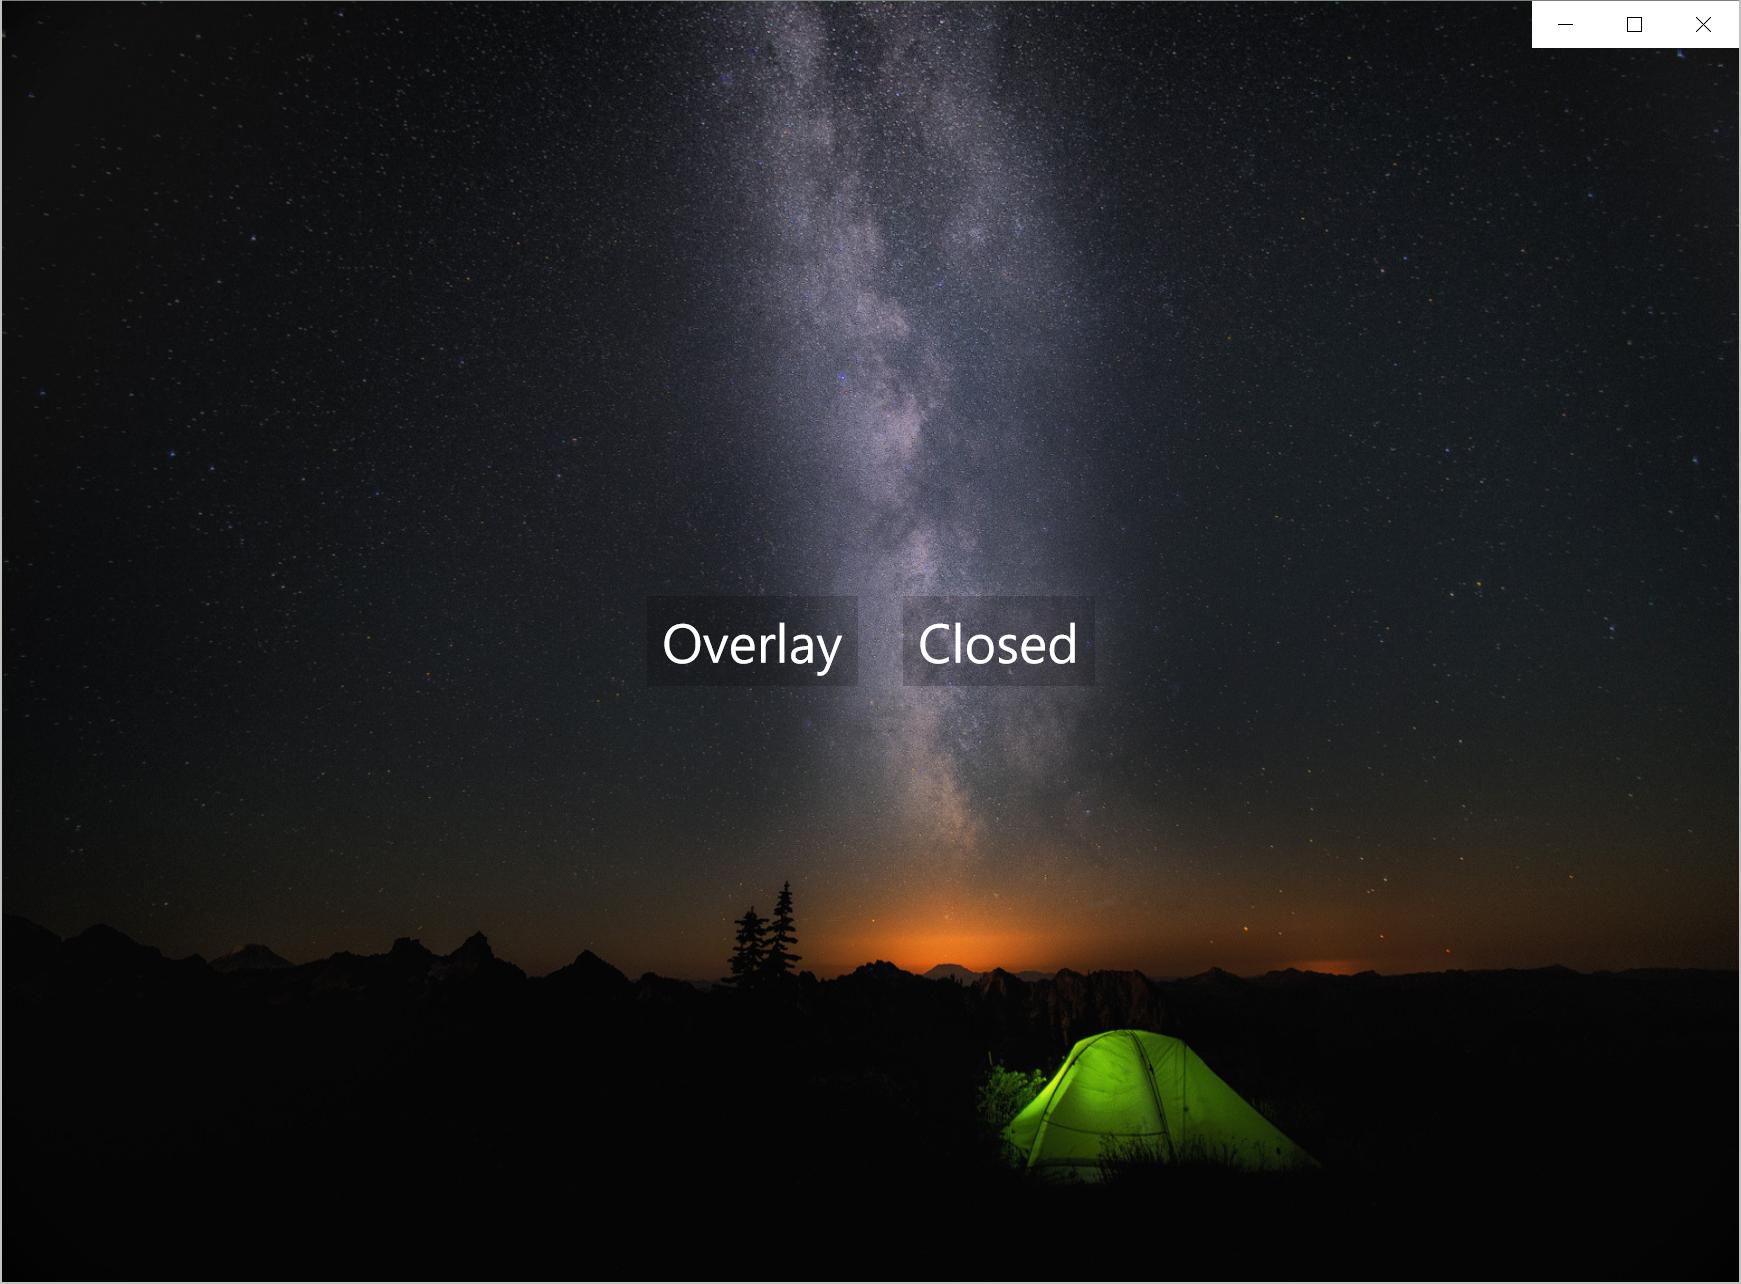 DisplayMode = Overlay IsPaneOpen = True